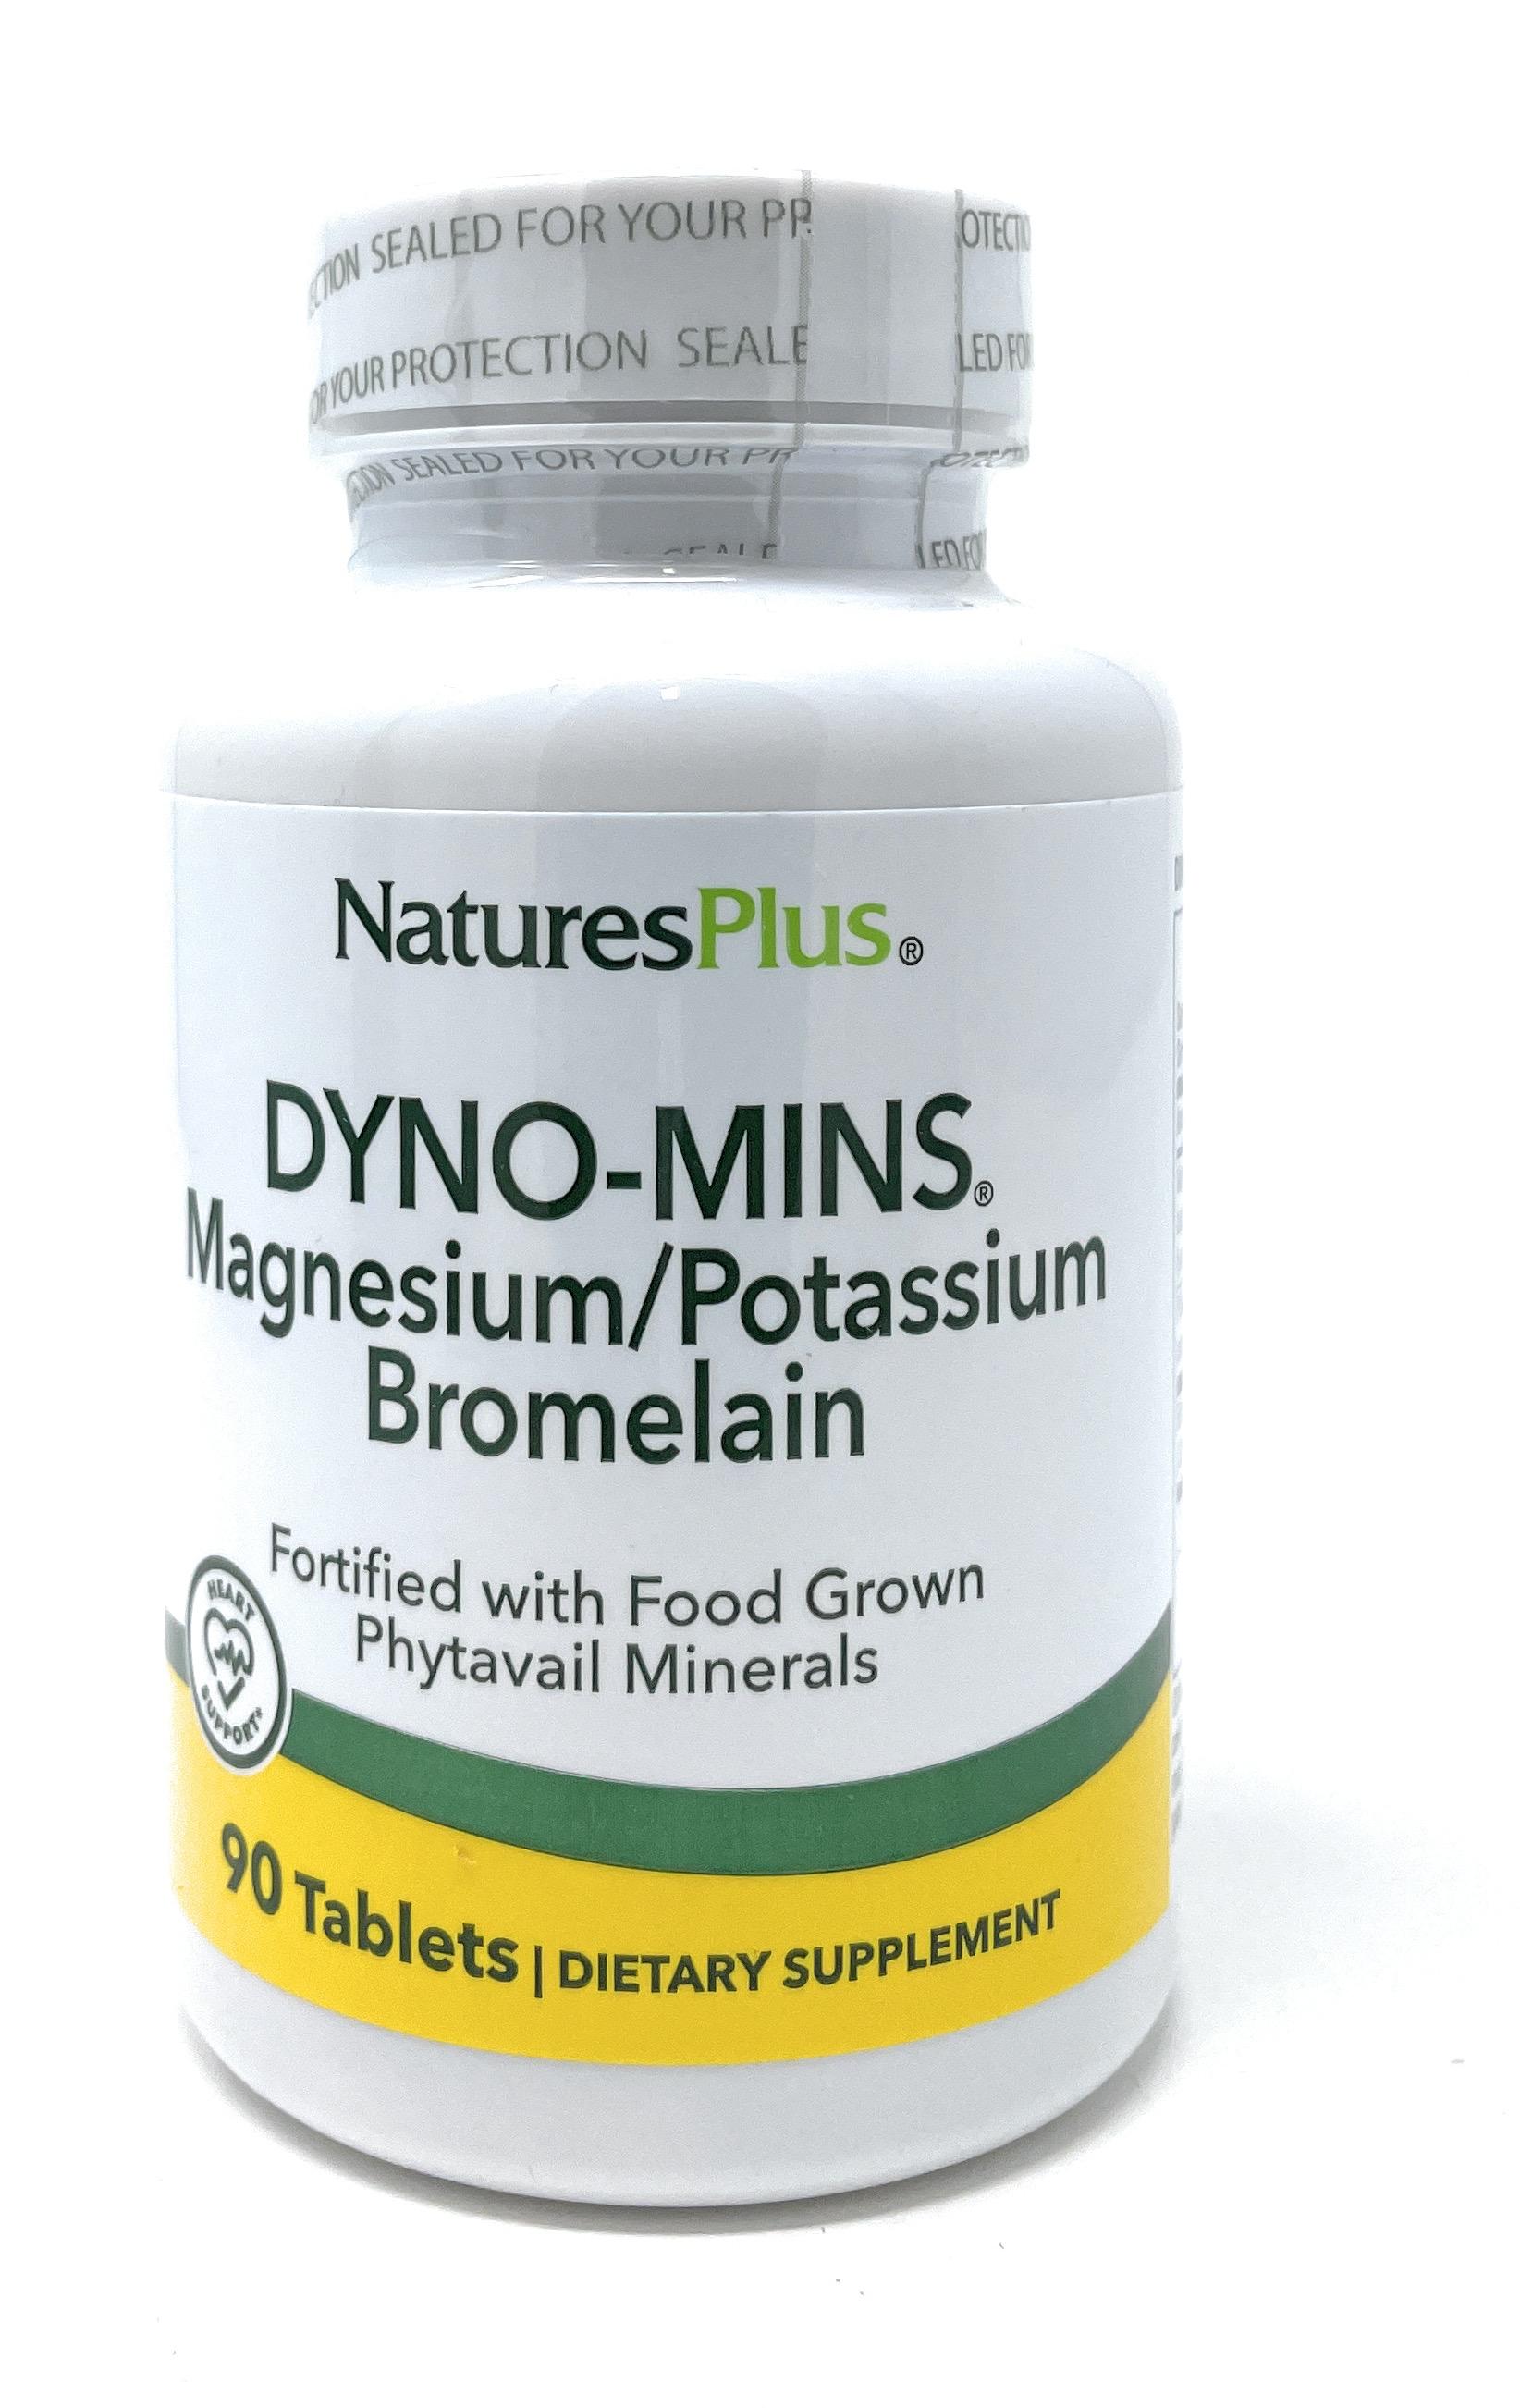 Natures Plus DYNO-MINS® Magnesium, Potassium and Bromelain 90 Tabletten (130,1g)